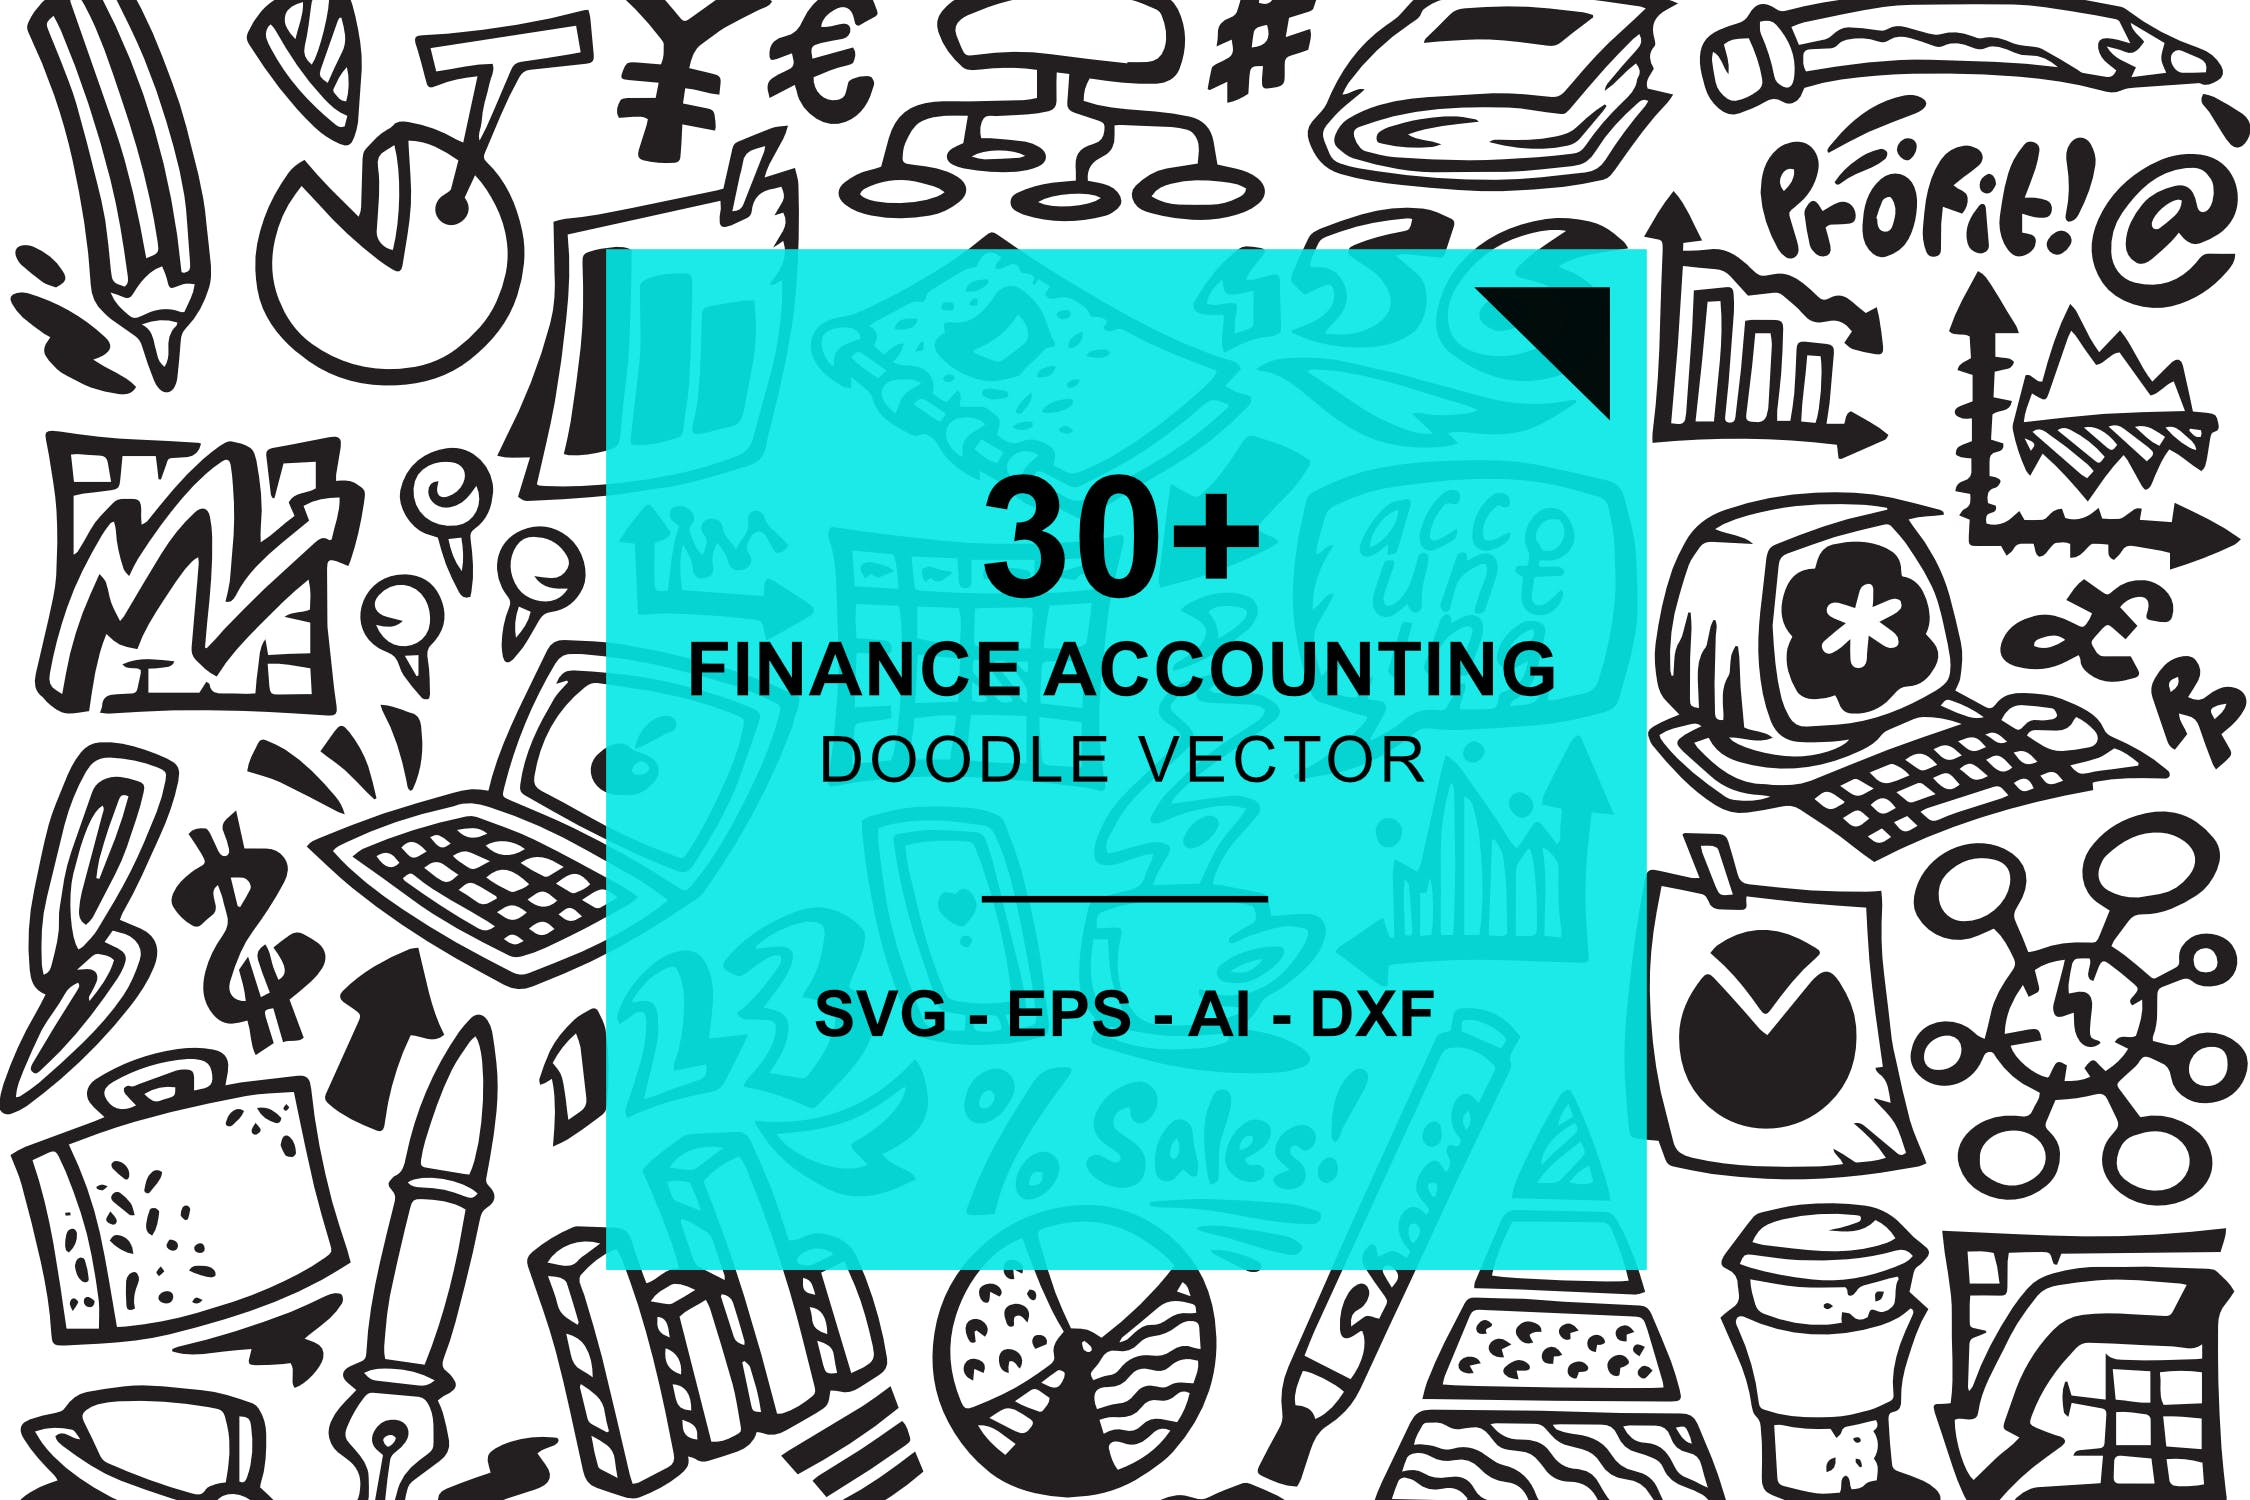 30+财会涂鸦插画矢量图标下载Finance and Accounting Doodles插图